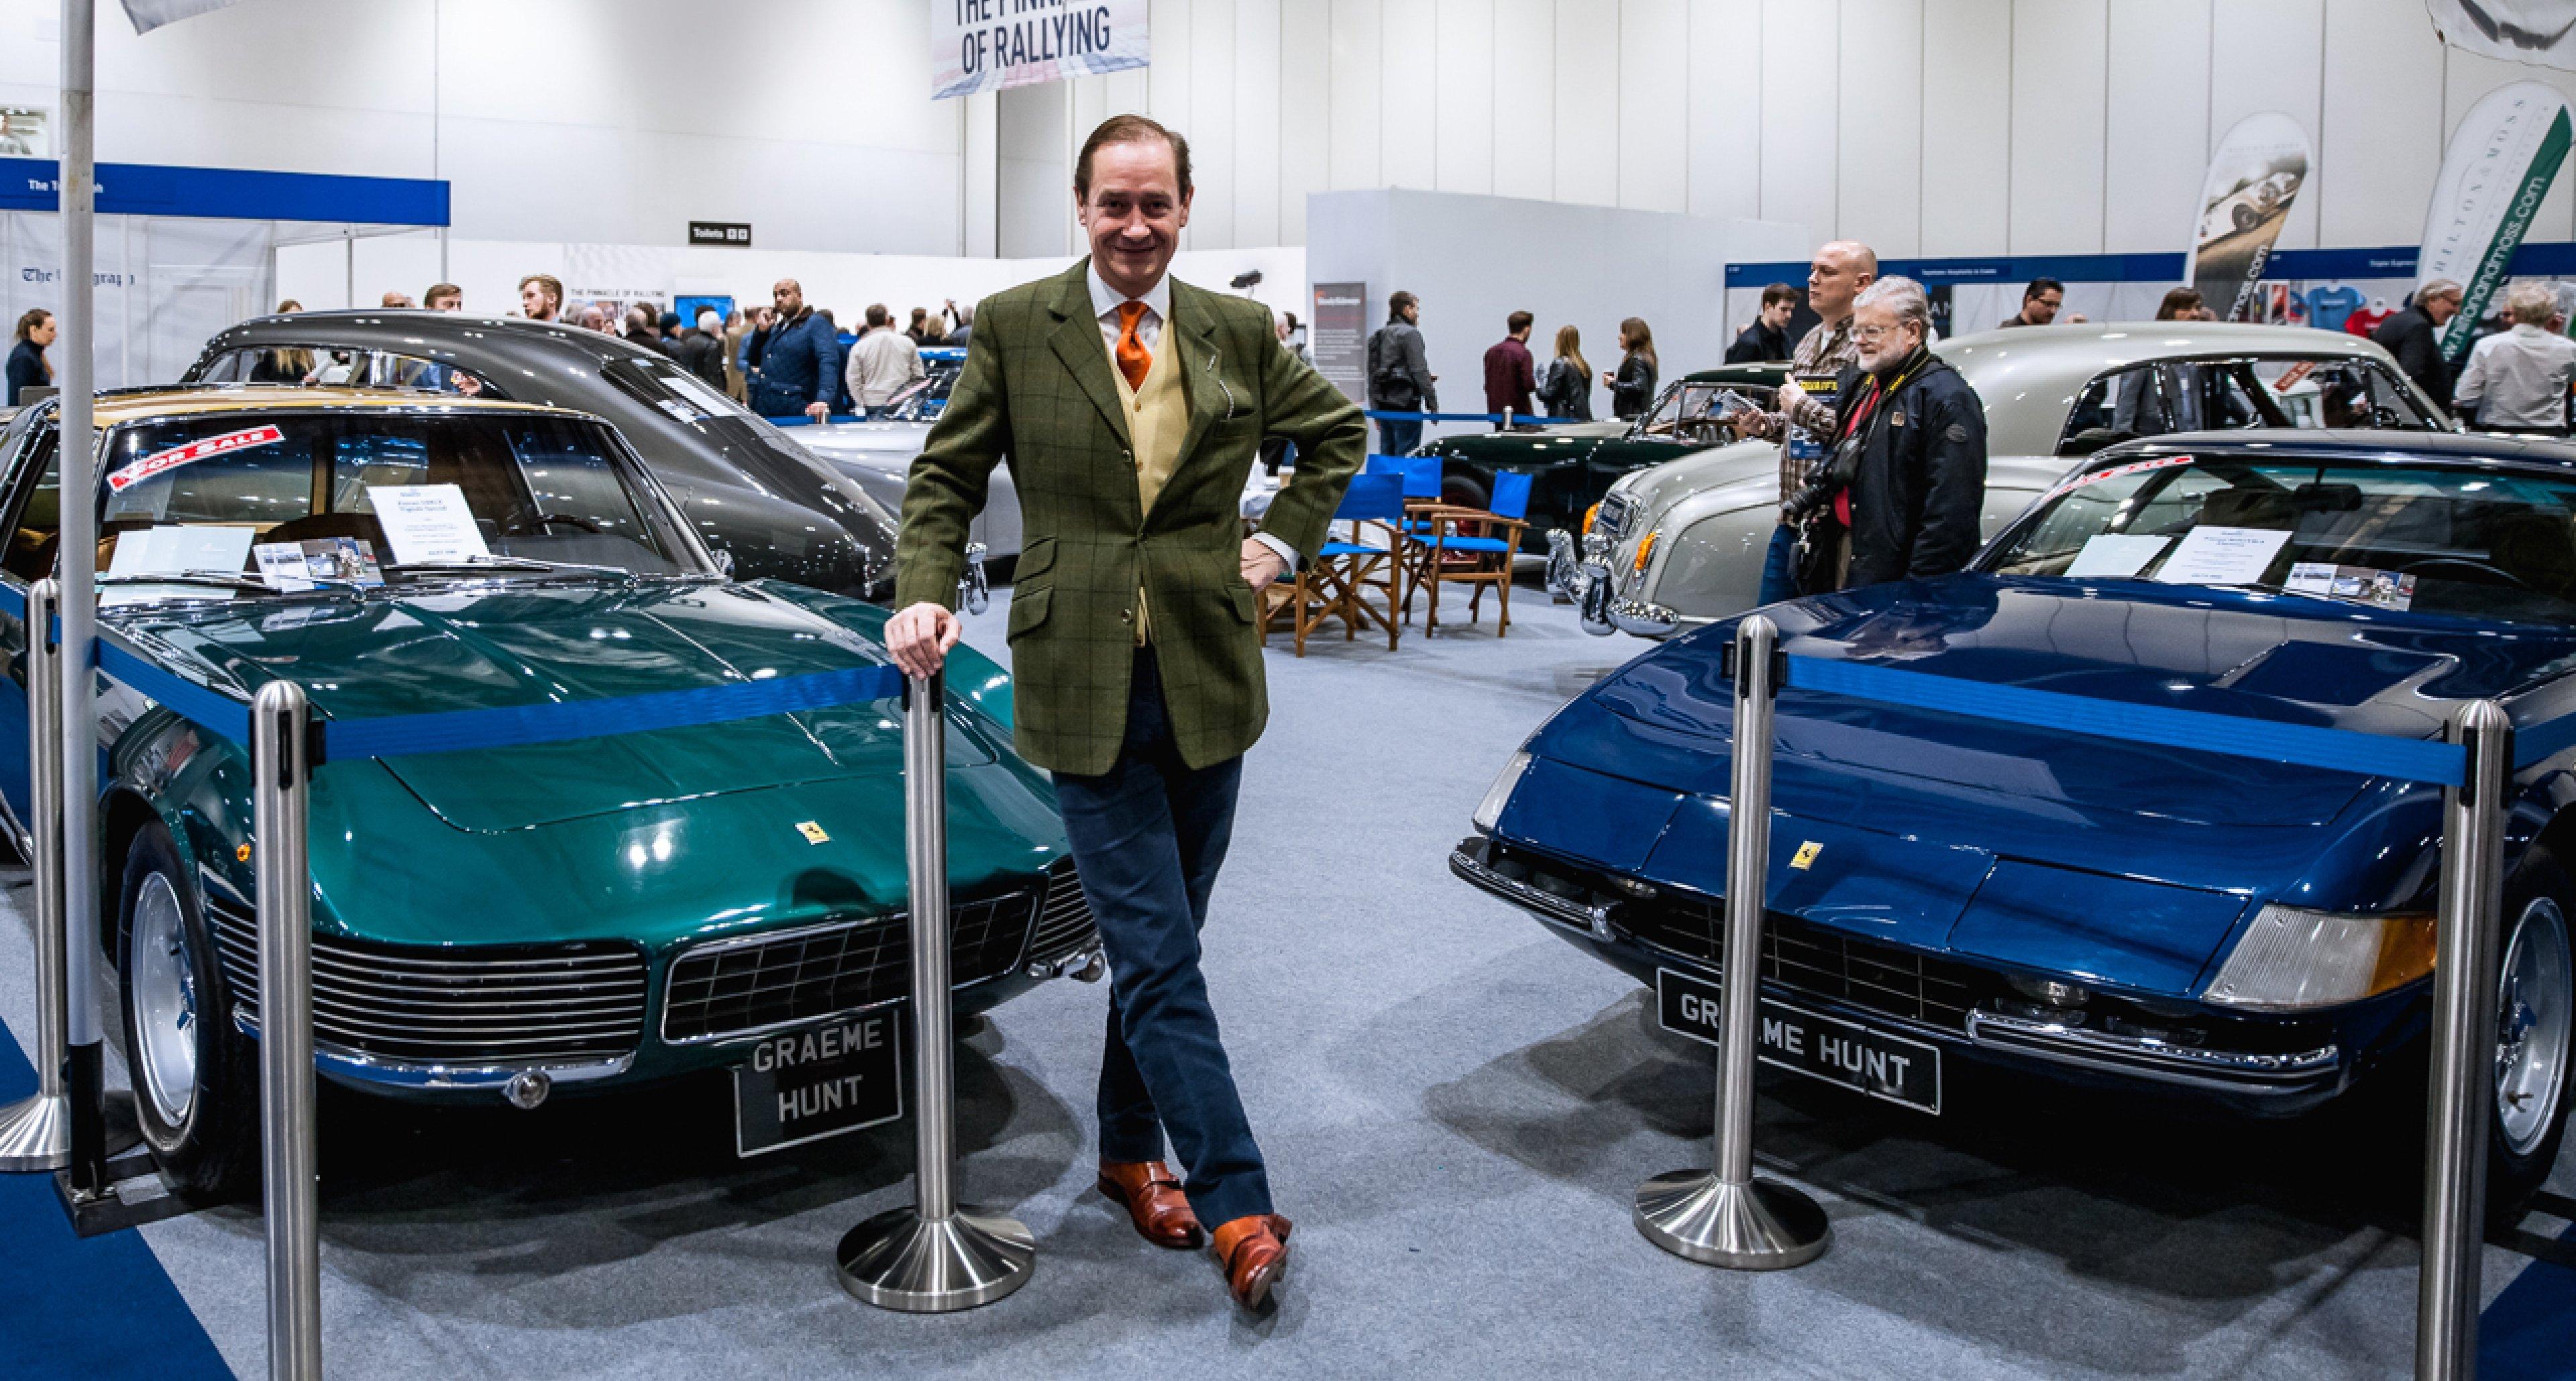 Graeme Hunt of Graeme Hunt Cars Ltd.